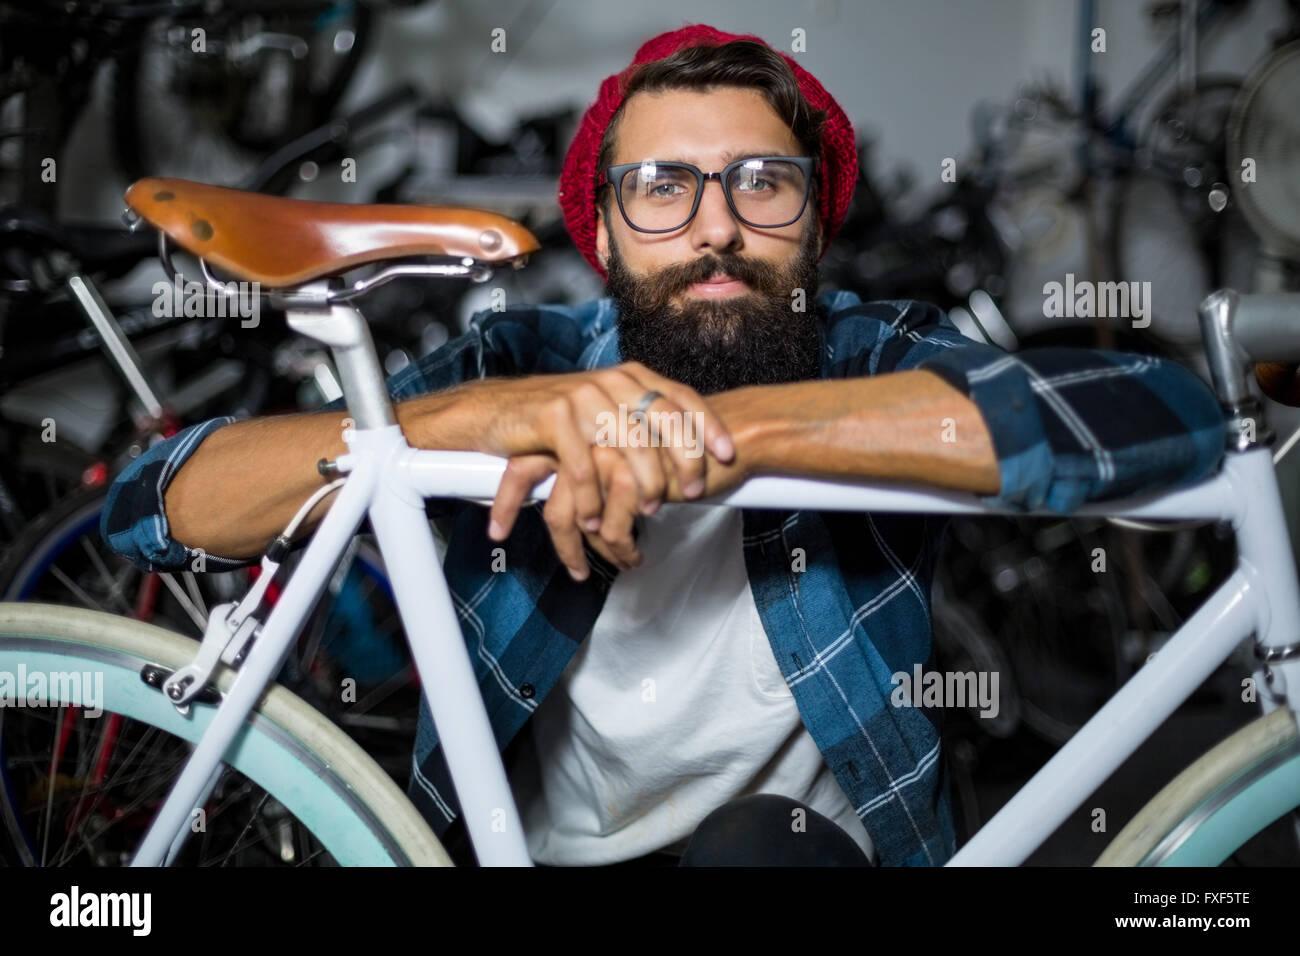 Bike mechanic checking at bicycle - Stock Image